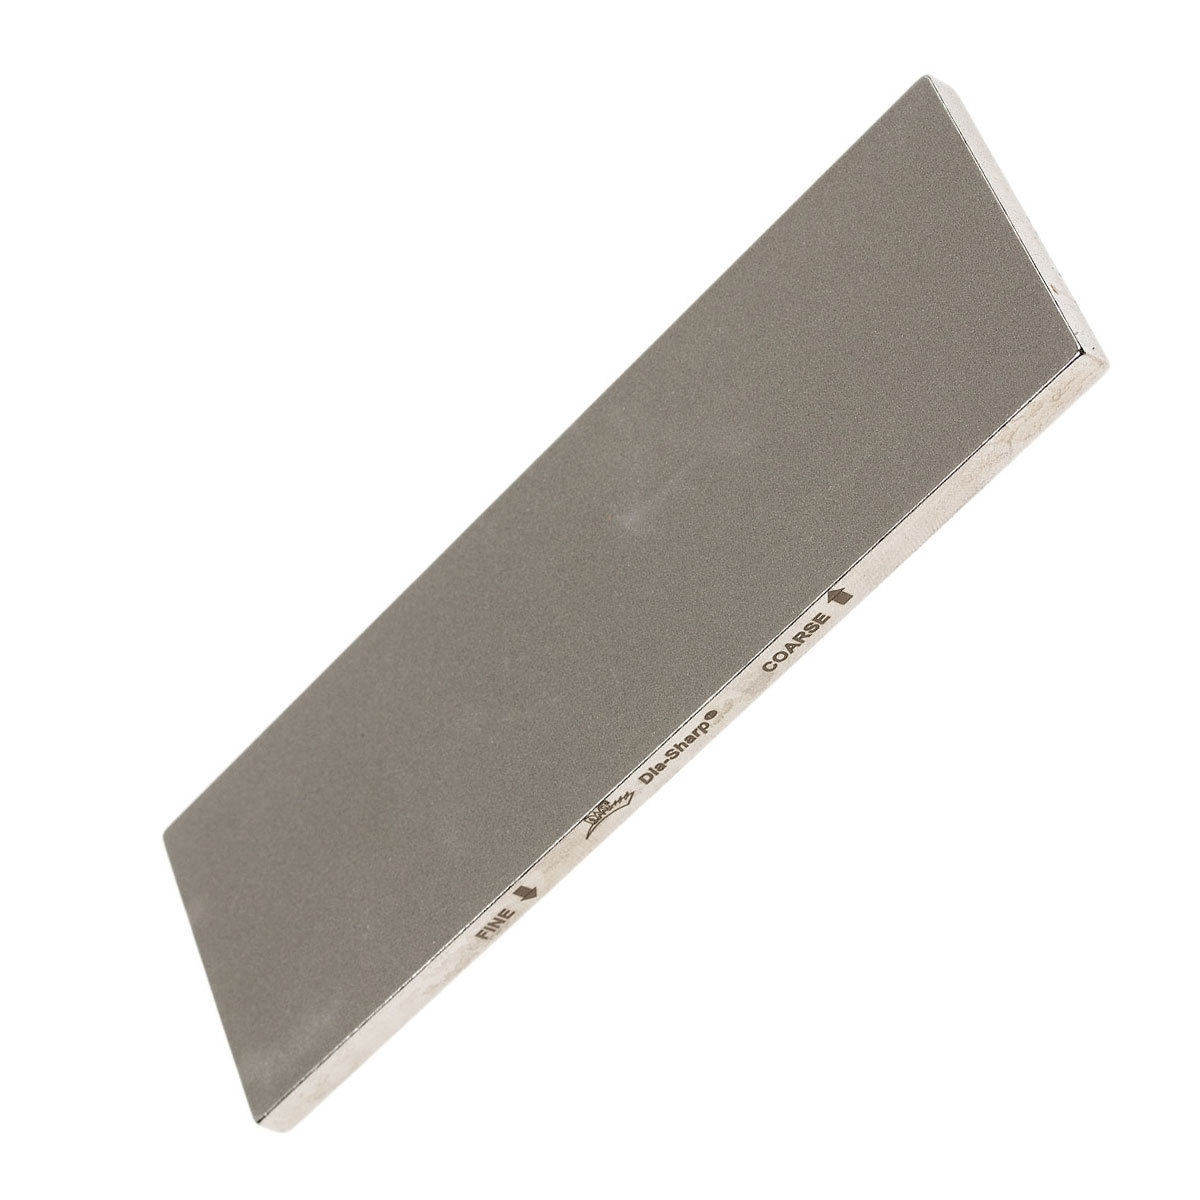 Алмазный брусок двусторонний DMT® DiaSharp Fine / Coarse, 600 меш, 25 мкм / 325 меш, 45 мкм от DMT® Diamond Machining Technology